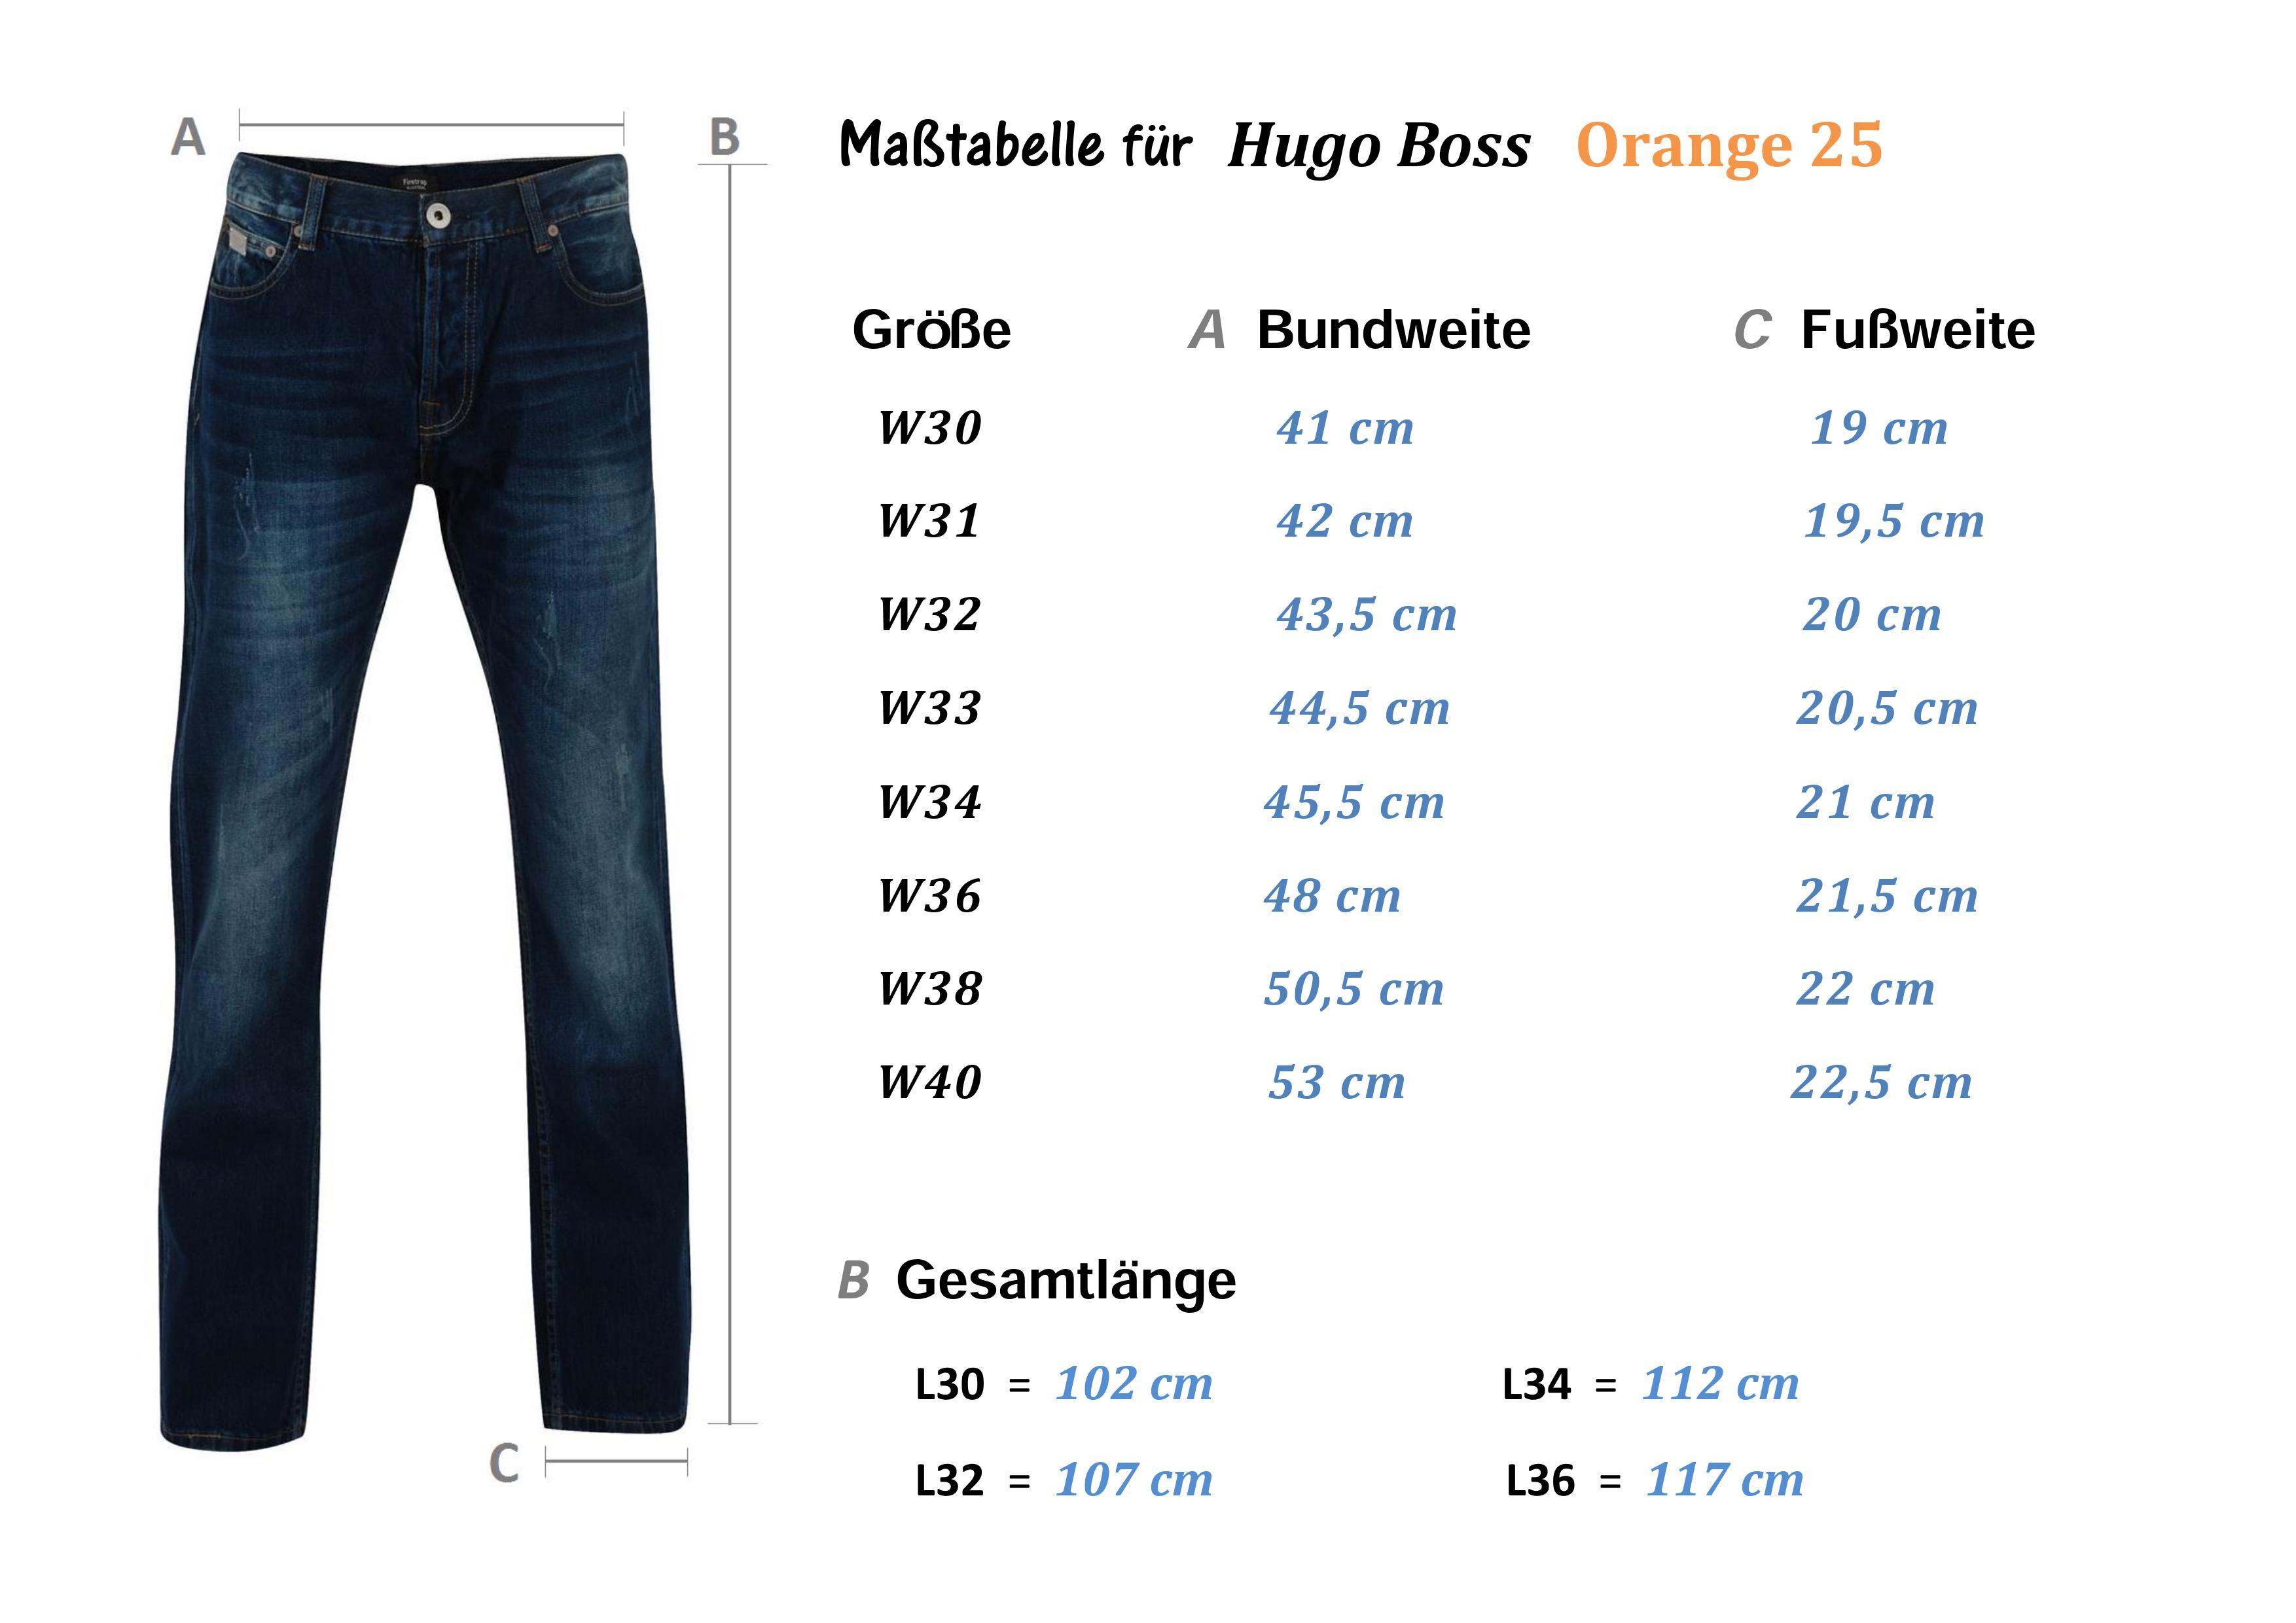 neu hugo boss w32 l32 orange 25 pure denim regular straight jeans 32 32 ebay. Black Bedroom Furniture Sets. Home Design Ideas